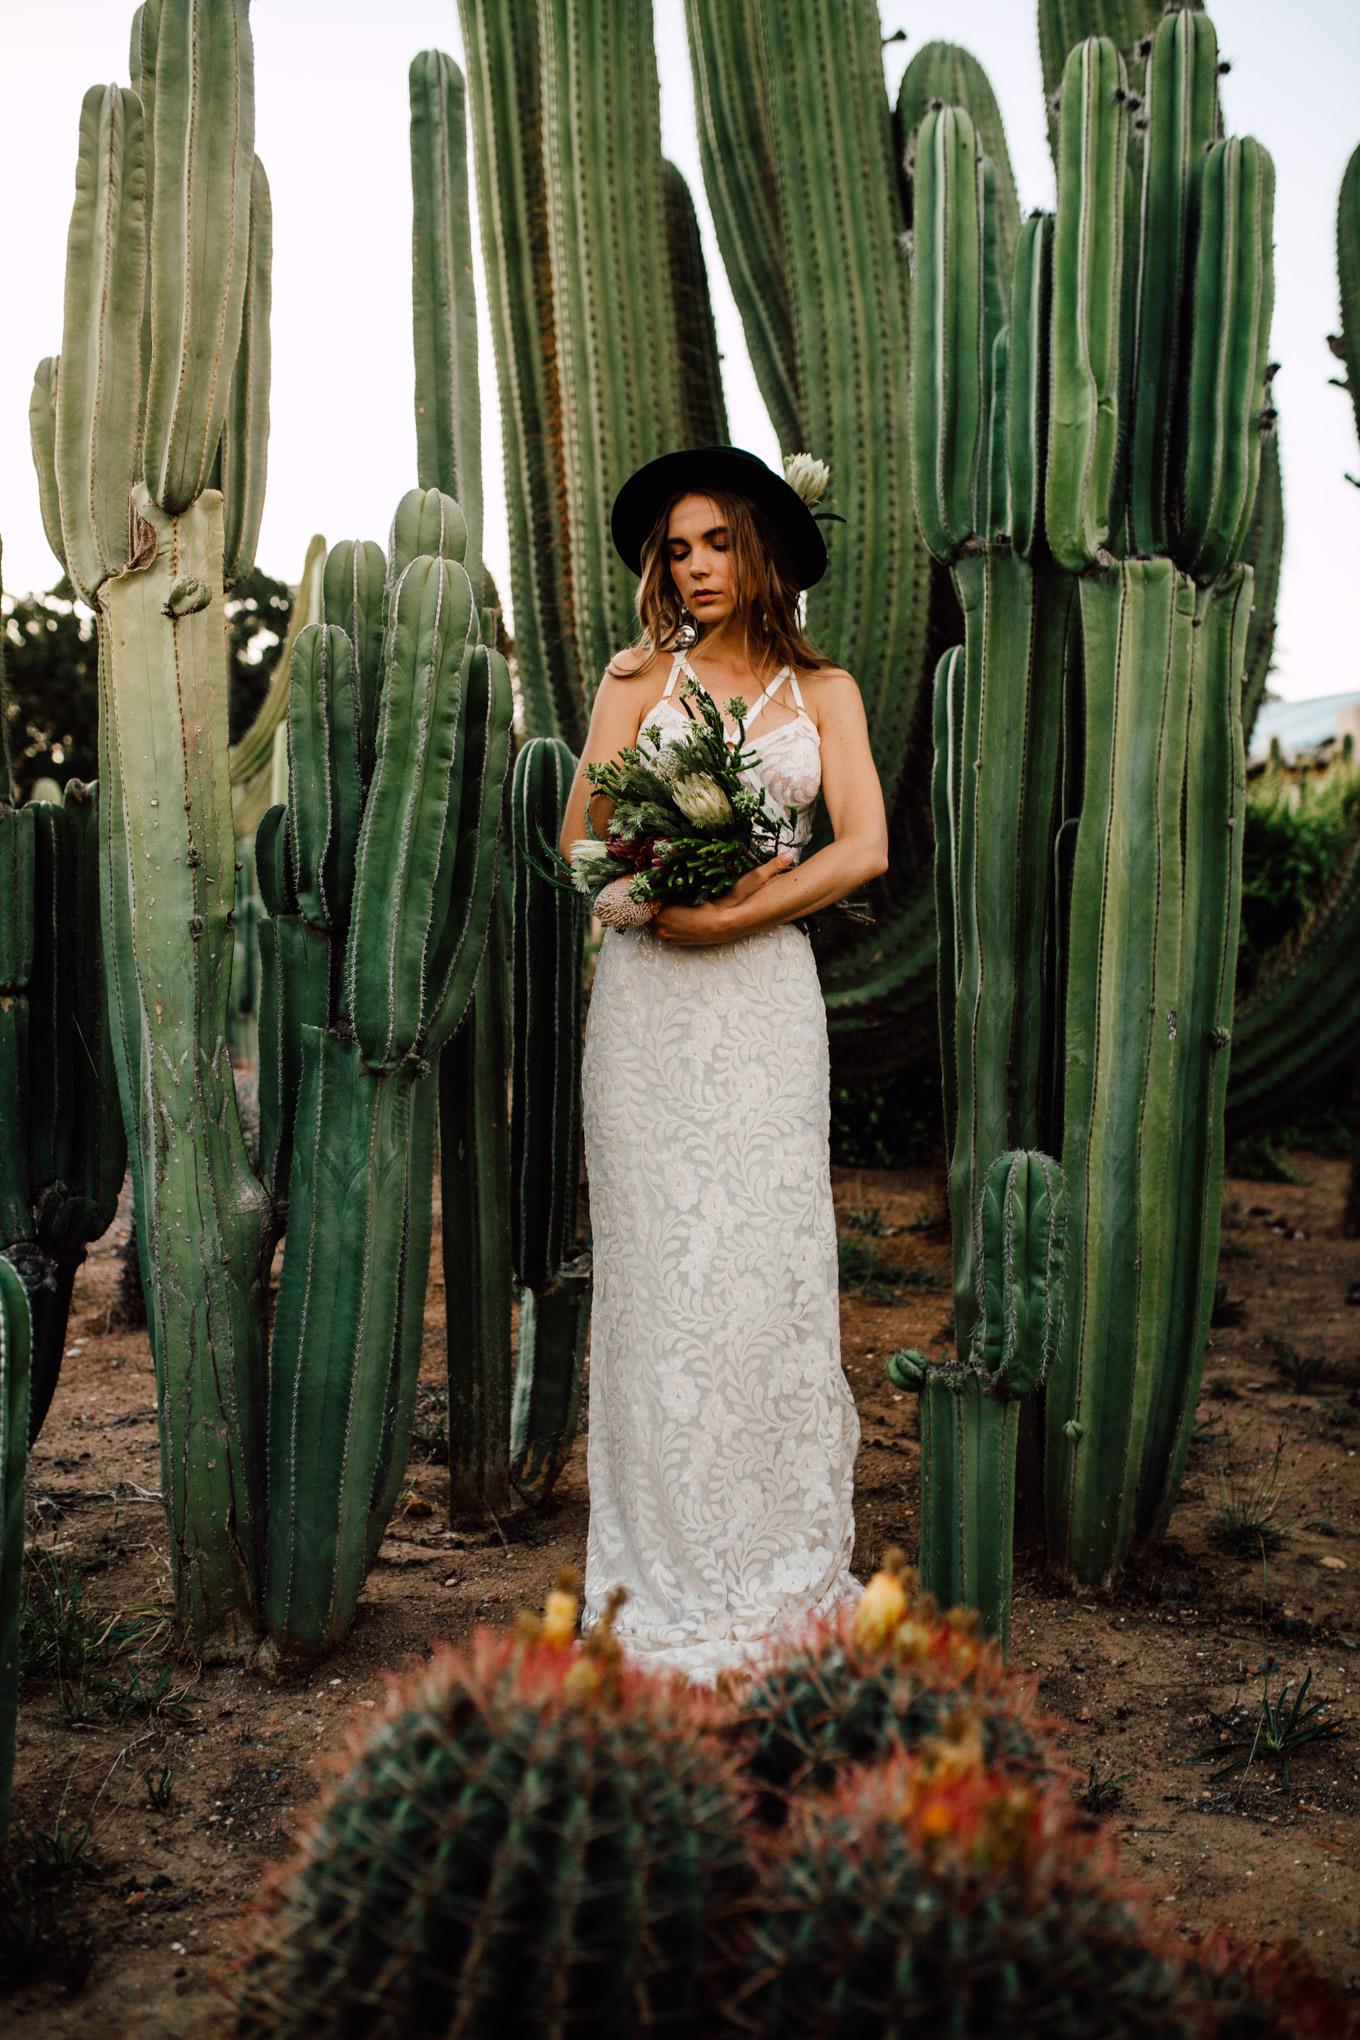 Cape-Town-Pia-Anna-Christian-Wedding-Photography-South-Africa-Bride-Cactus-29.jpg